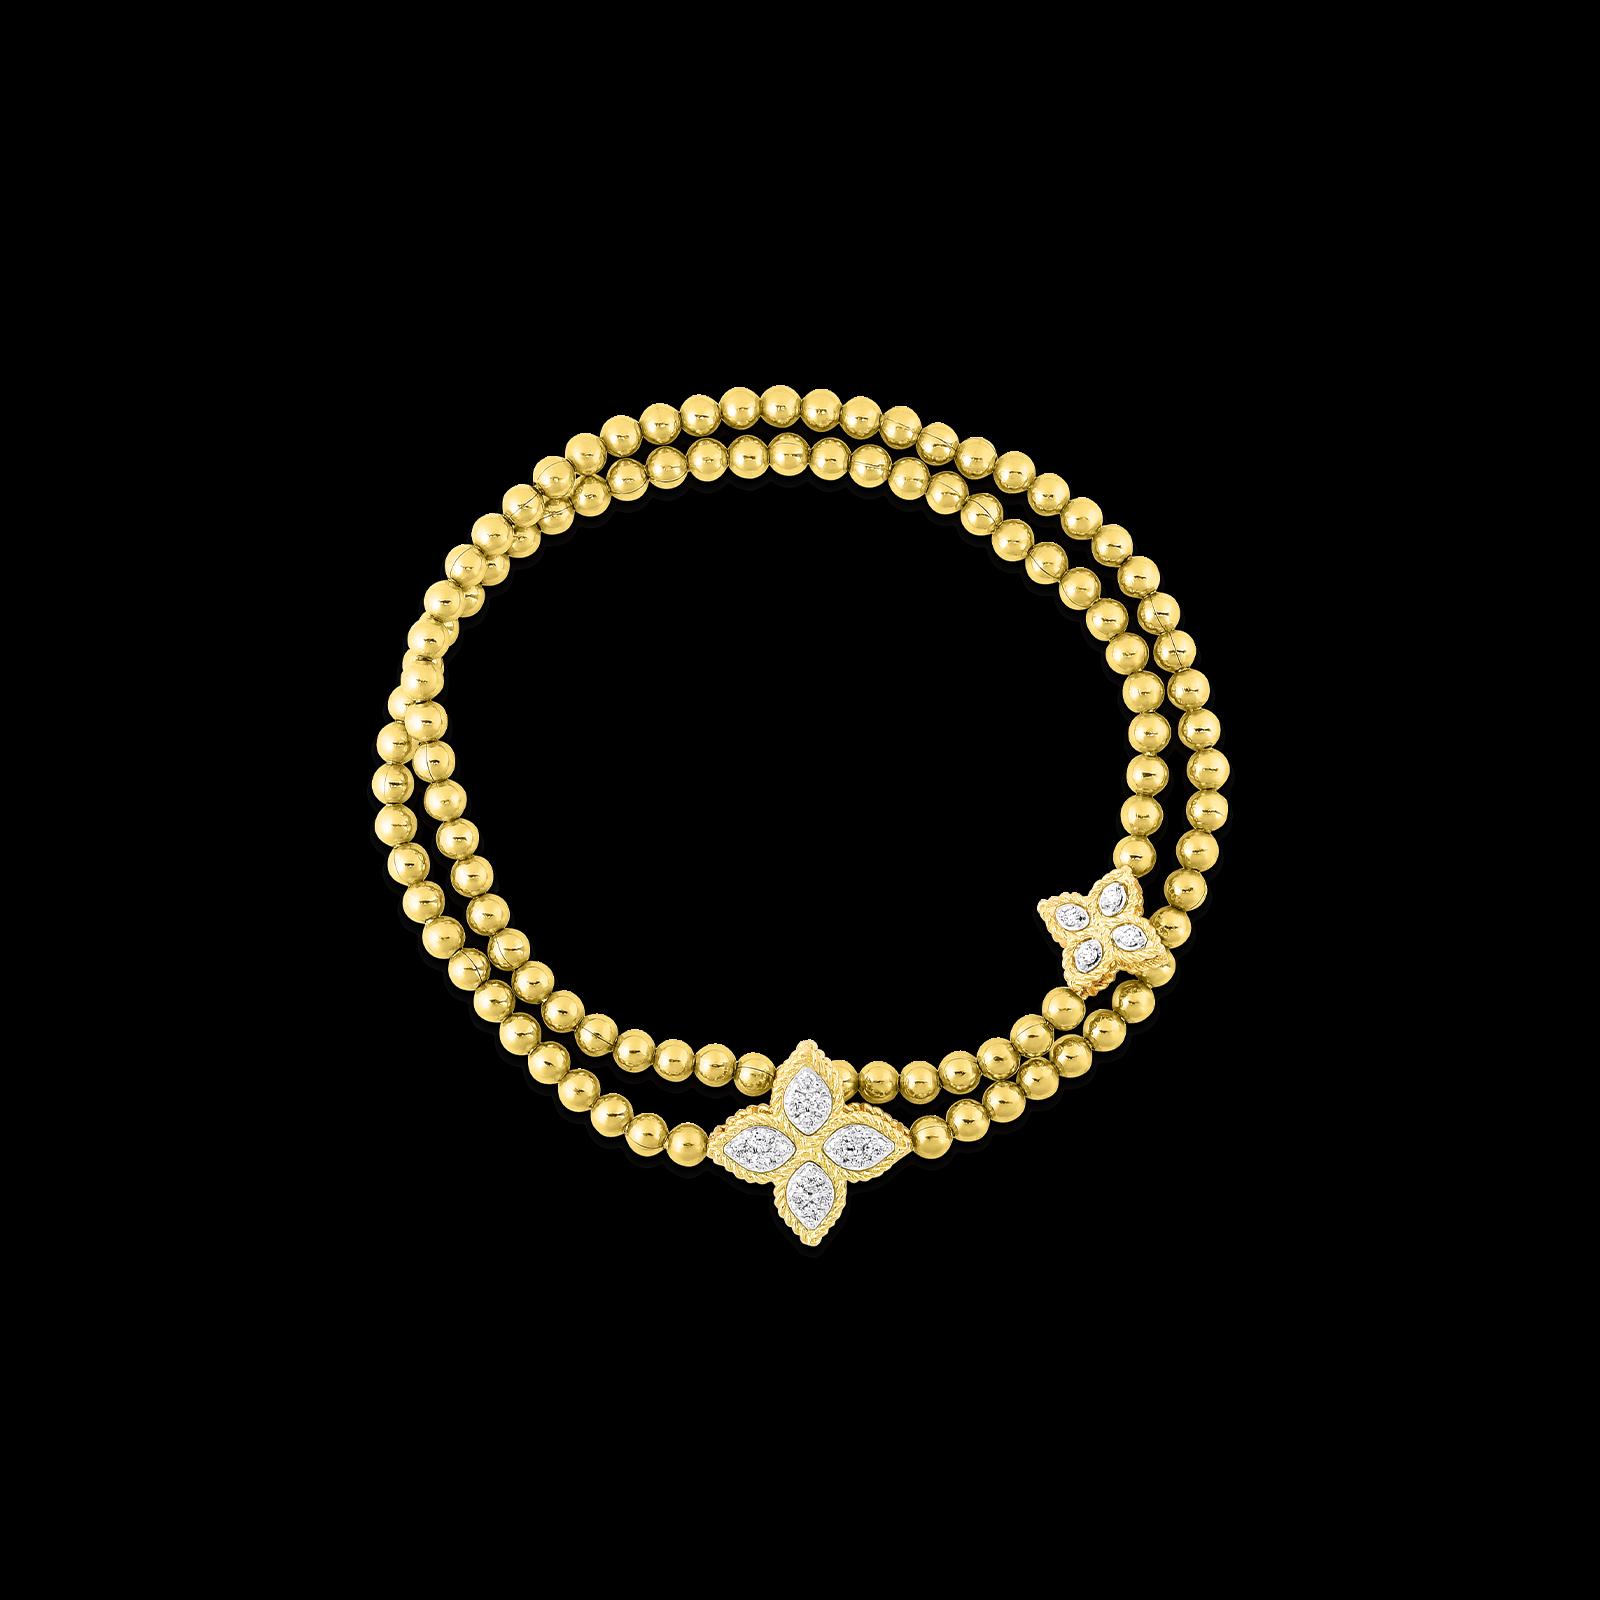 Roberto Coin Princess Flower Double Strand Diamond Bracelet in 18K Gold main view